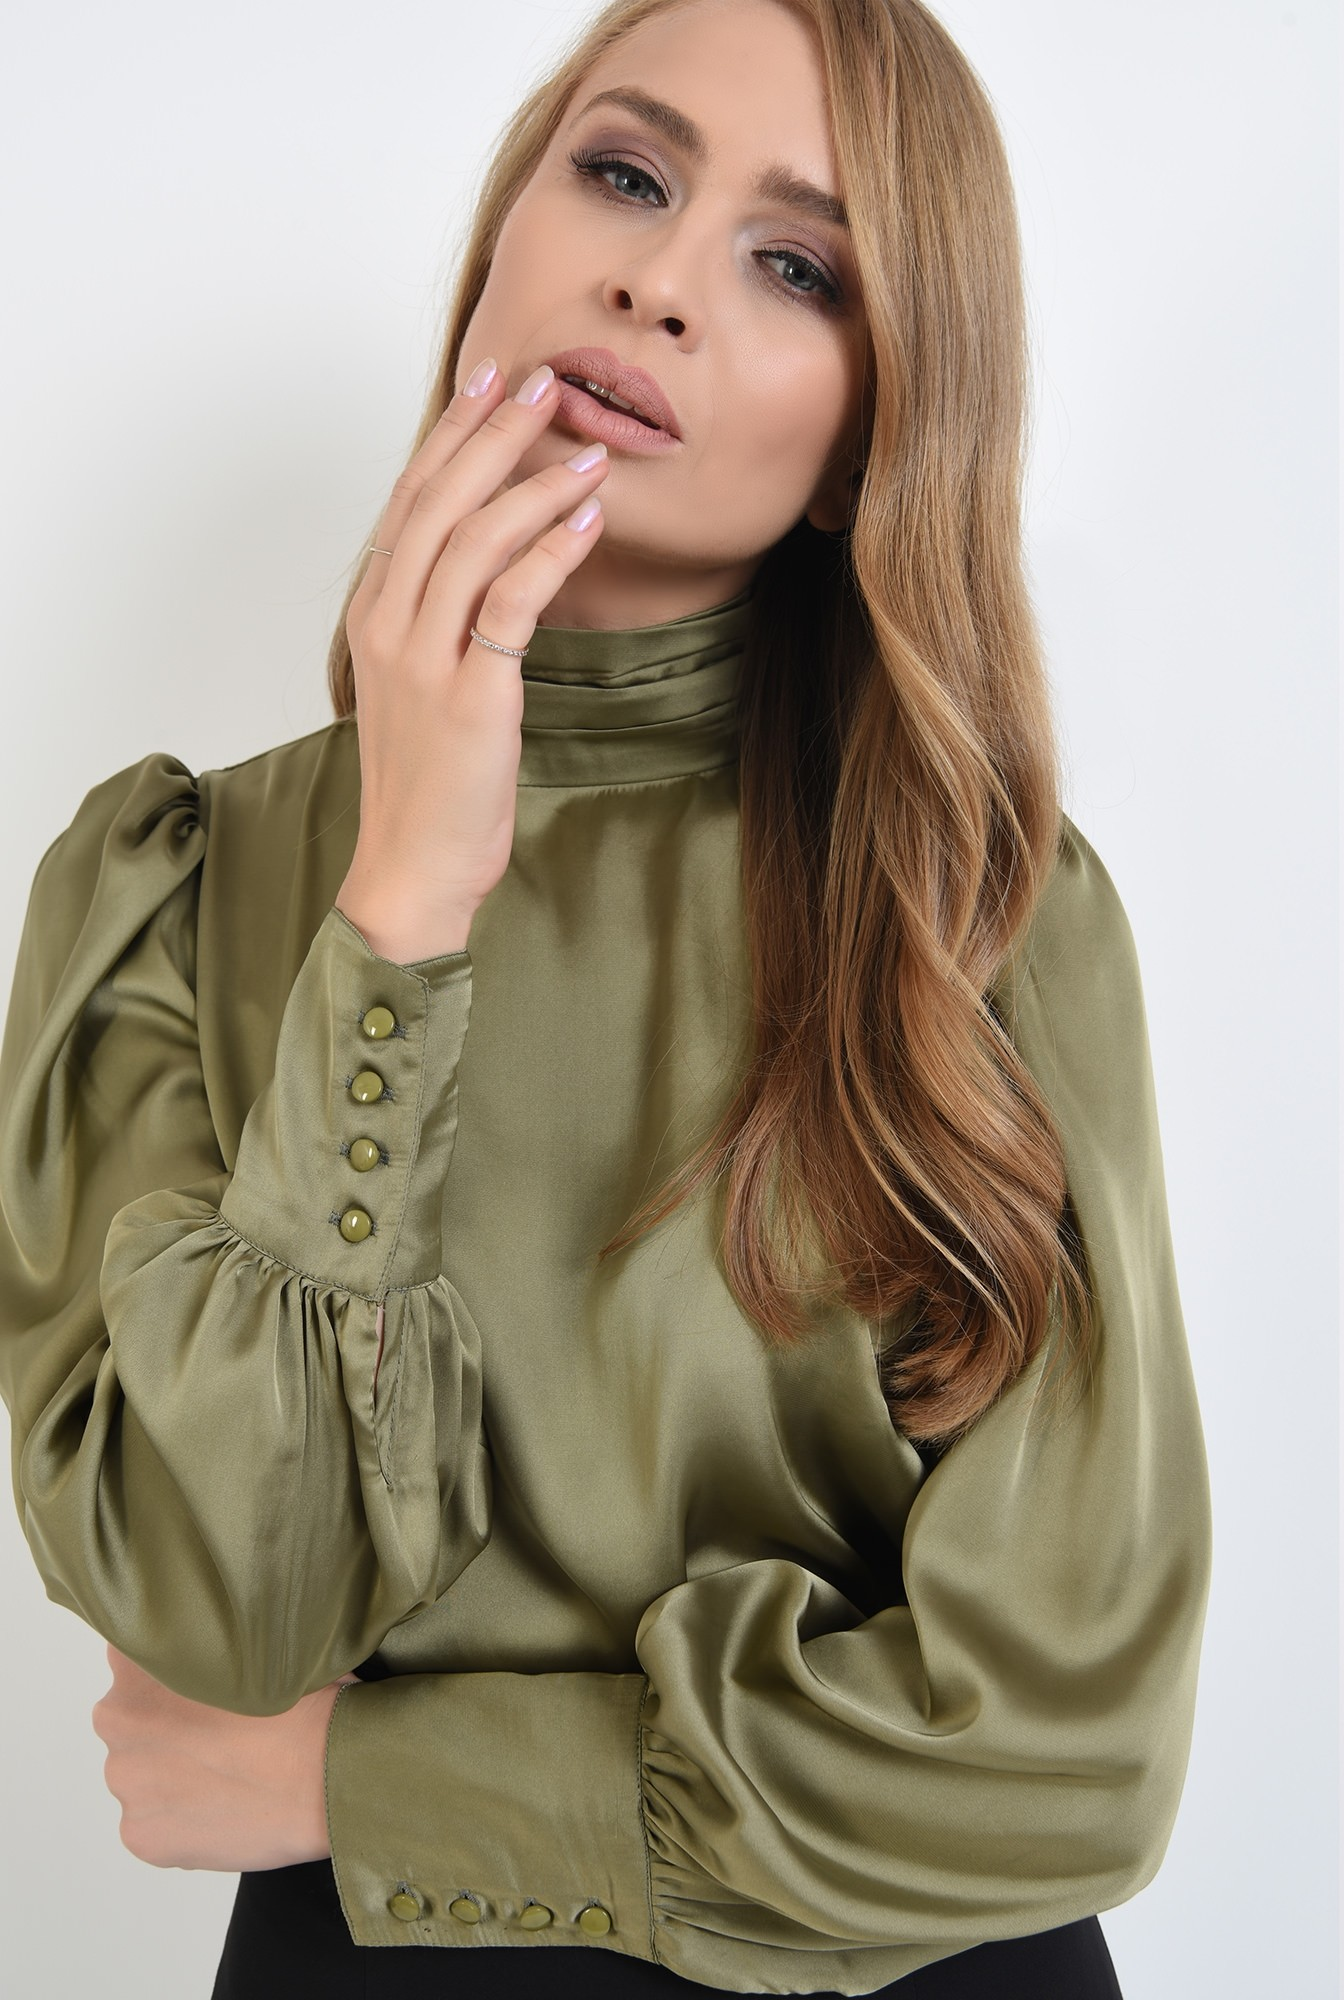 2 - 360 - bluza casual, cu umeri accentuati, cu nasturi la mansete